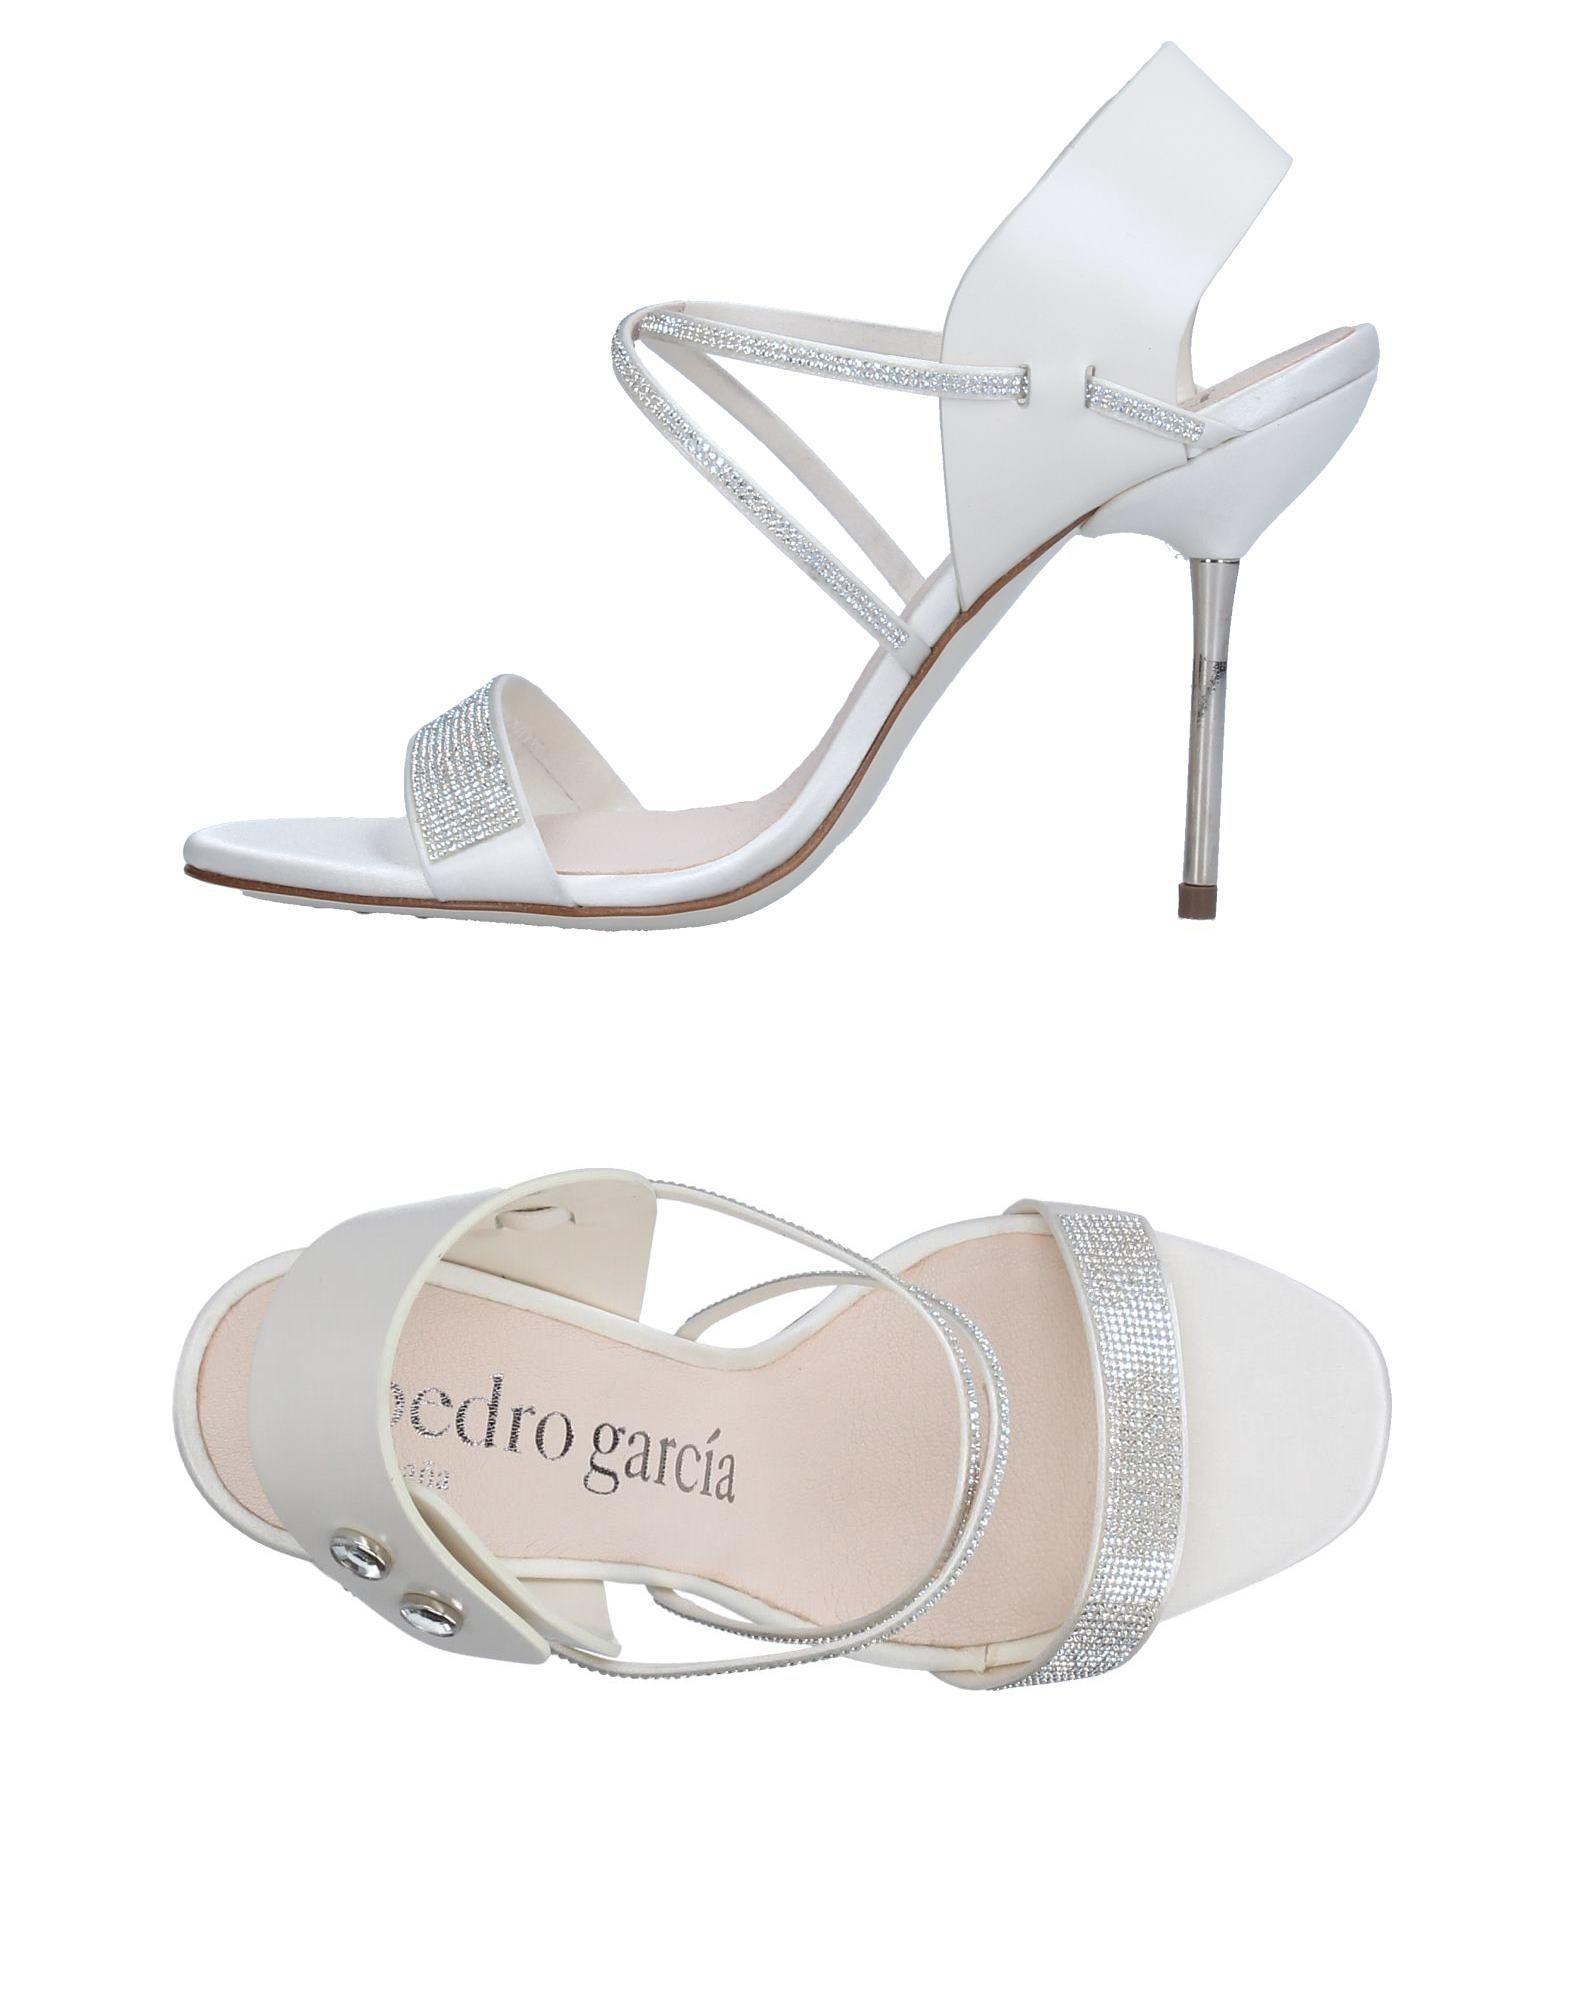 Pedro García Sandalen Damen  11280813MJ Gute Qualität beliebte Schuhe